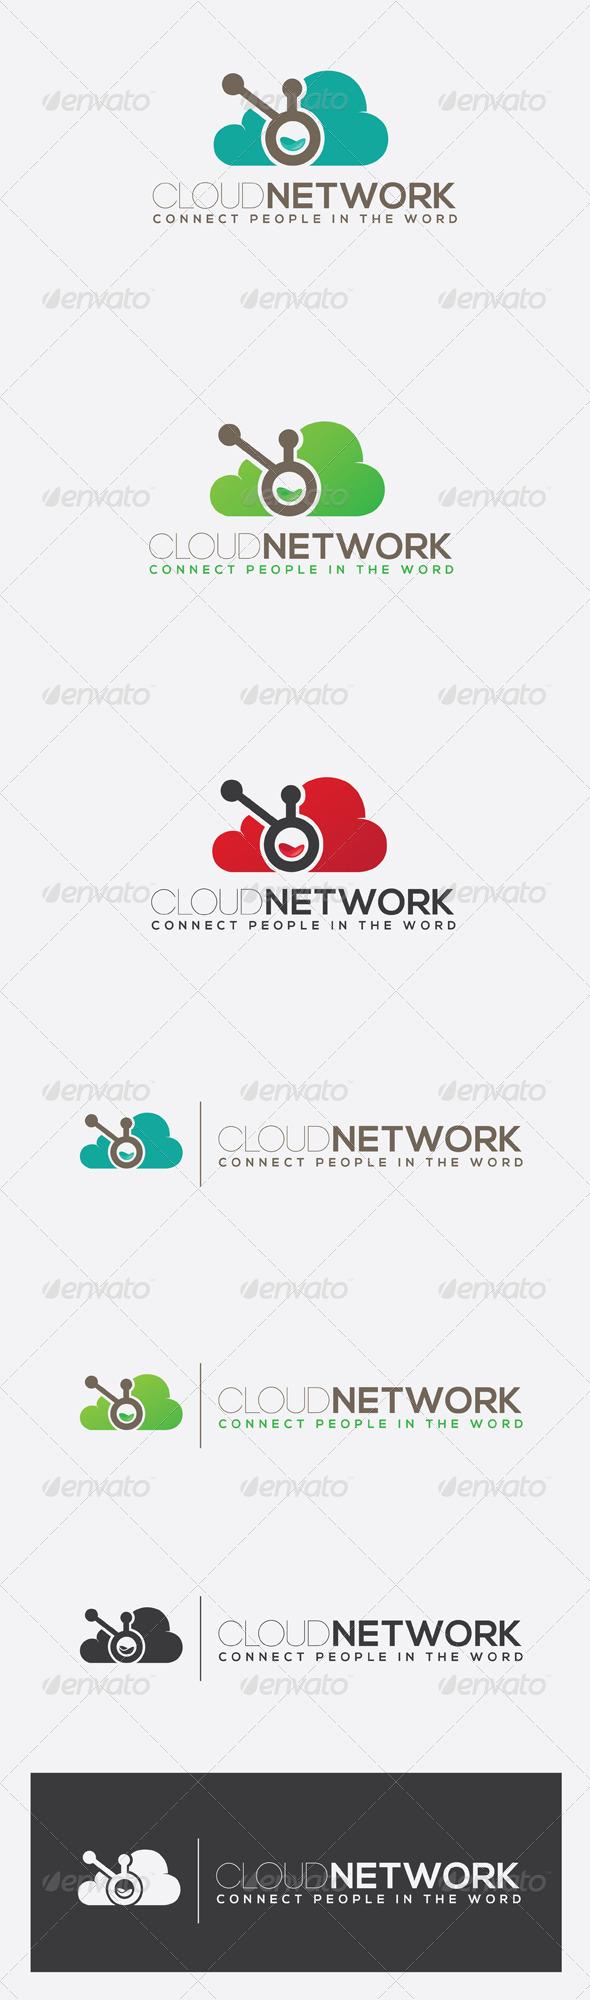 GraphicRiver Cloud Network Logo 7461609